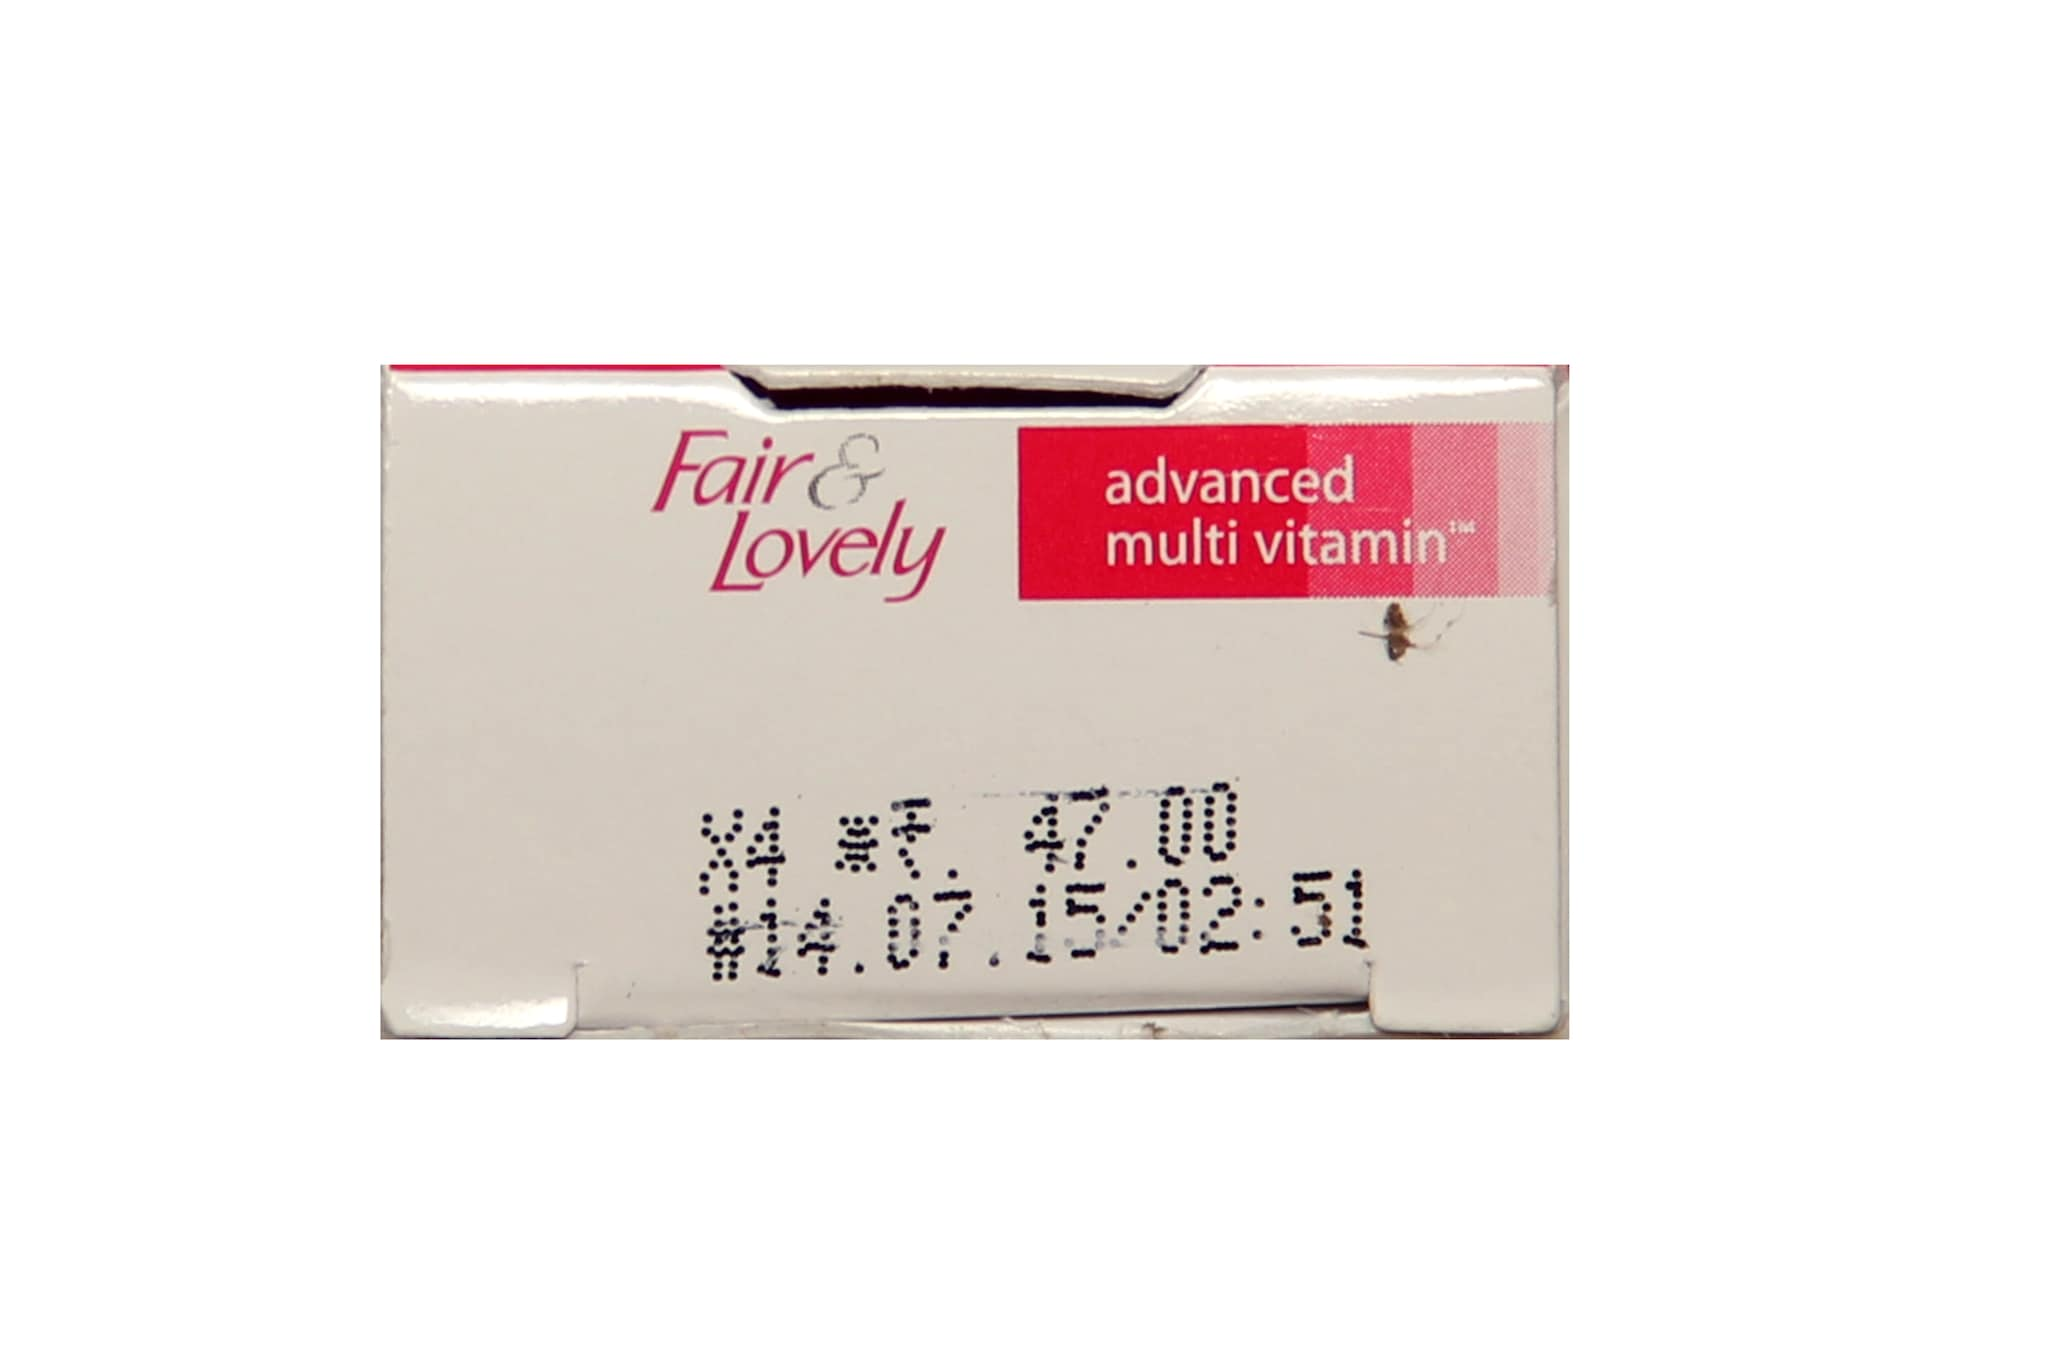 Fair&Lovely Advanced Multi-Vitamin Fairness Cream